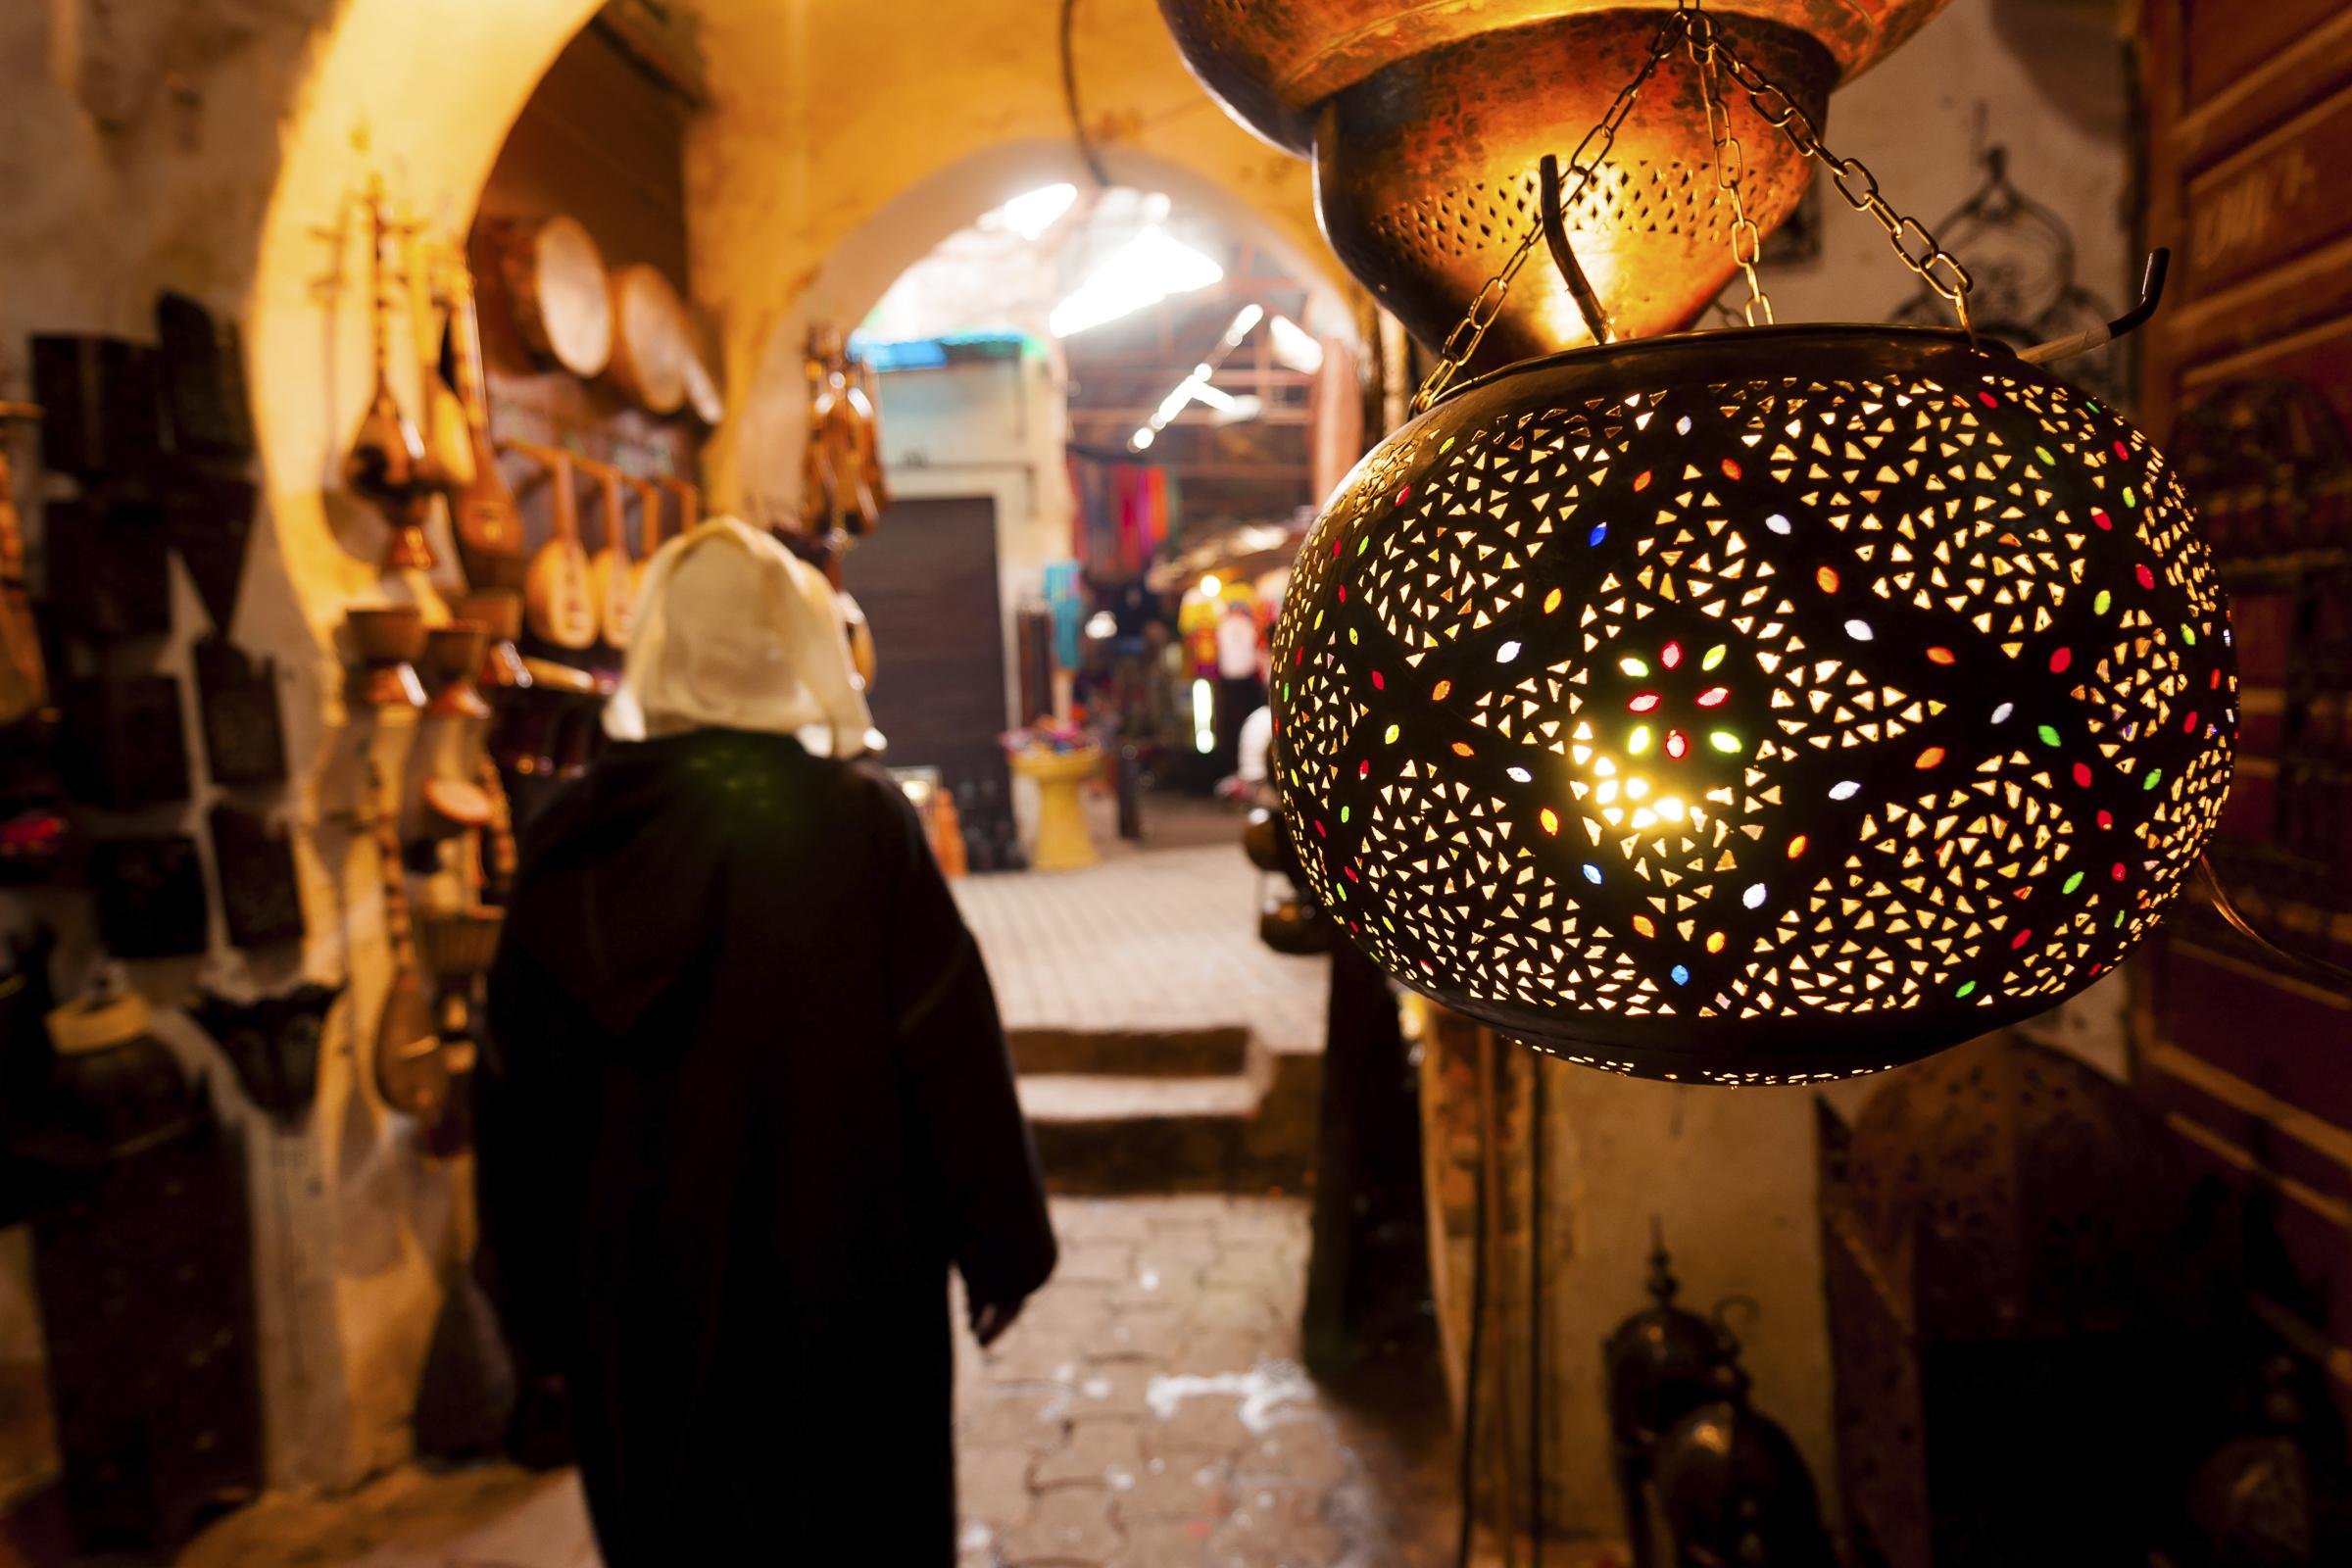 Lantern shop in Marrakech souk